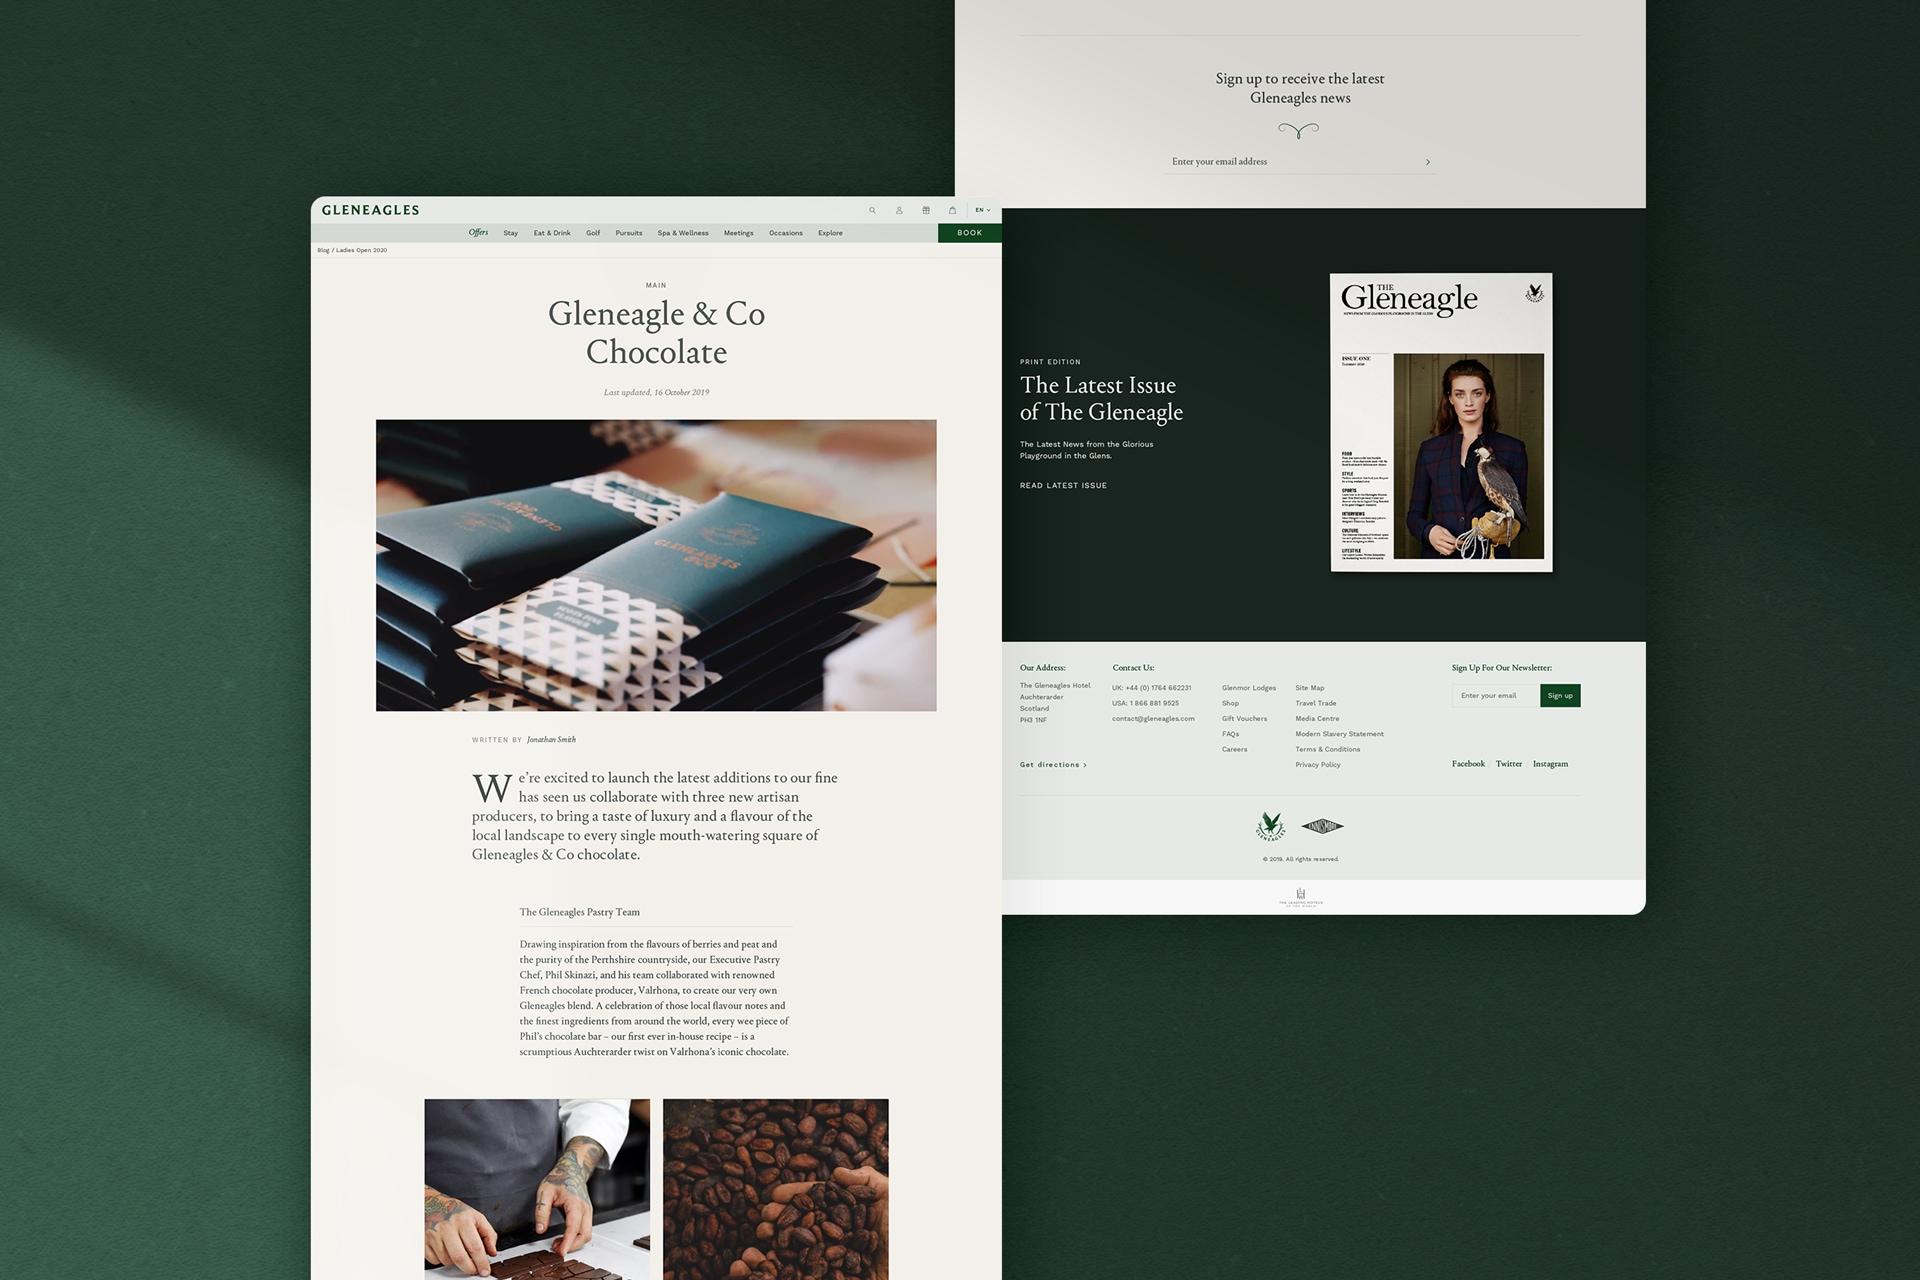 Glen_Desktop_FullPage_01